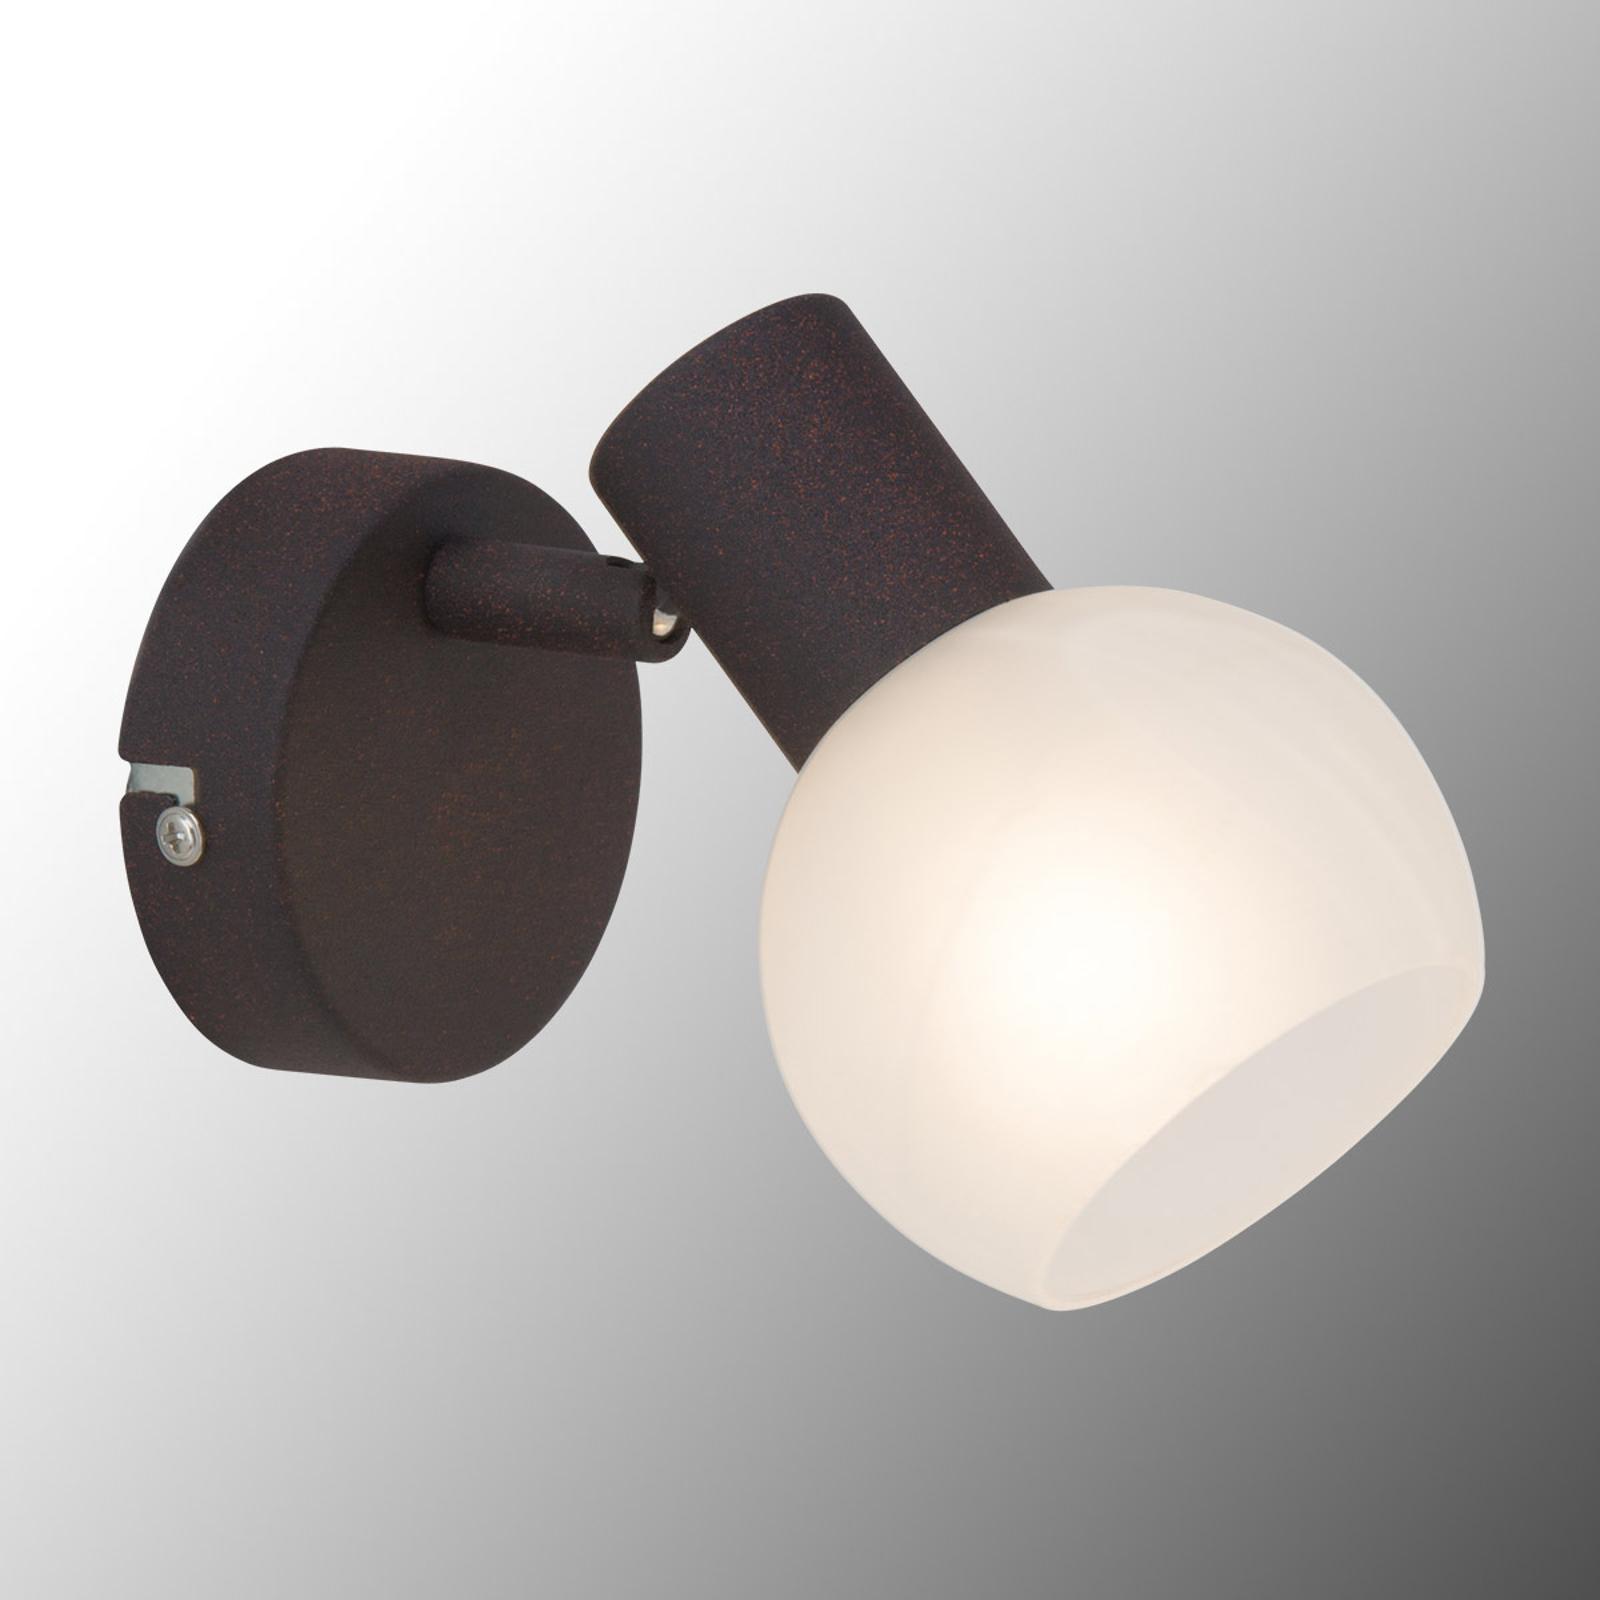 Lámpara de pared de contraste Gabón